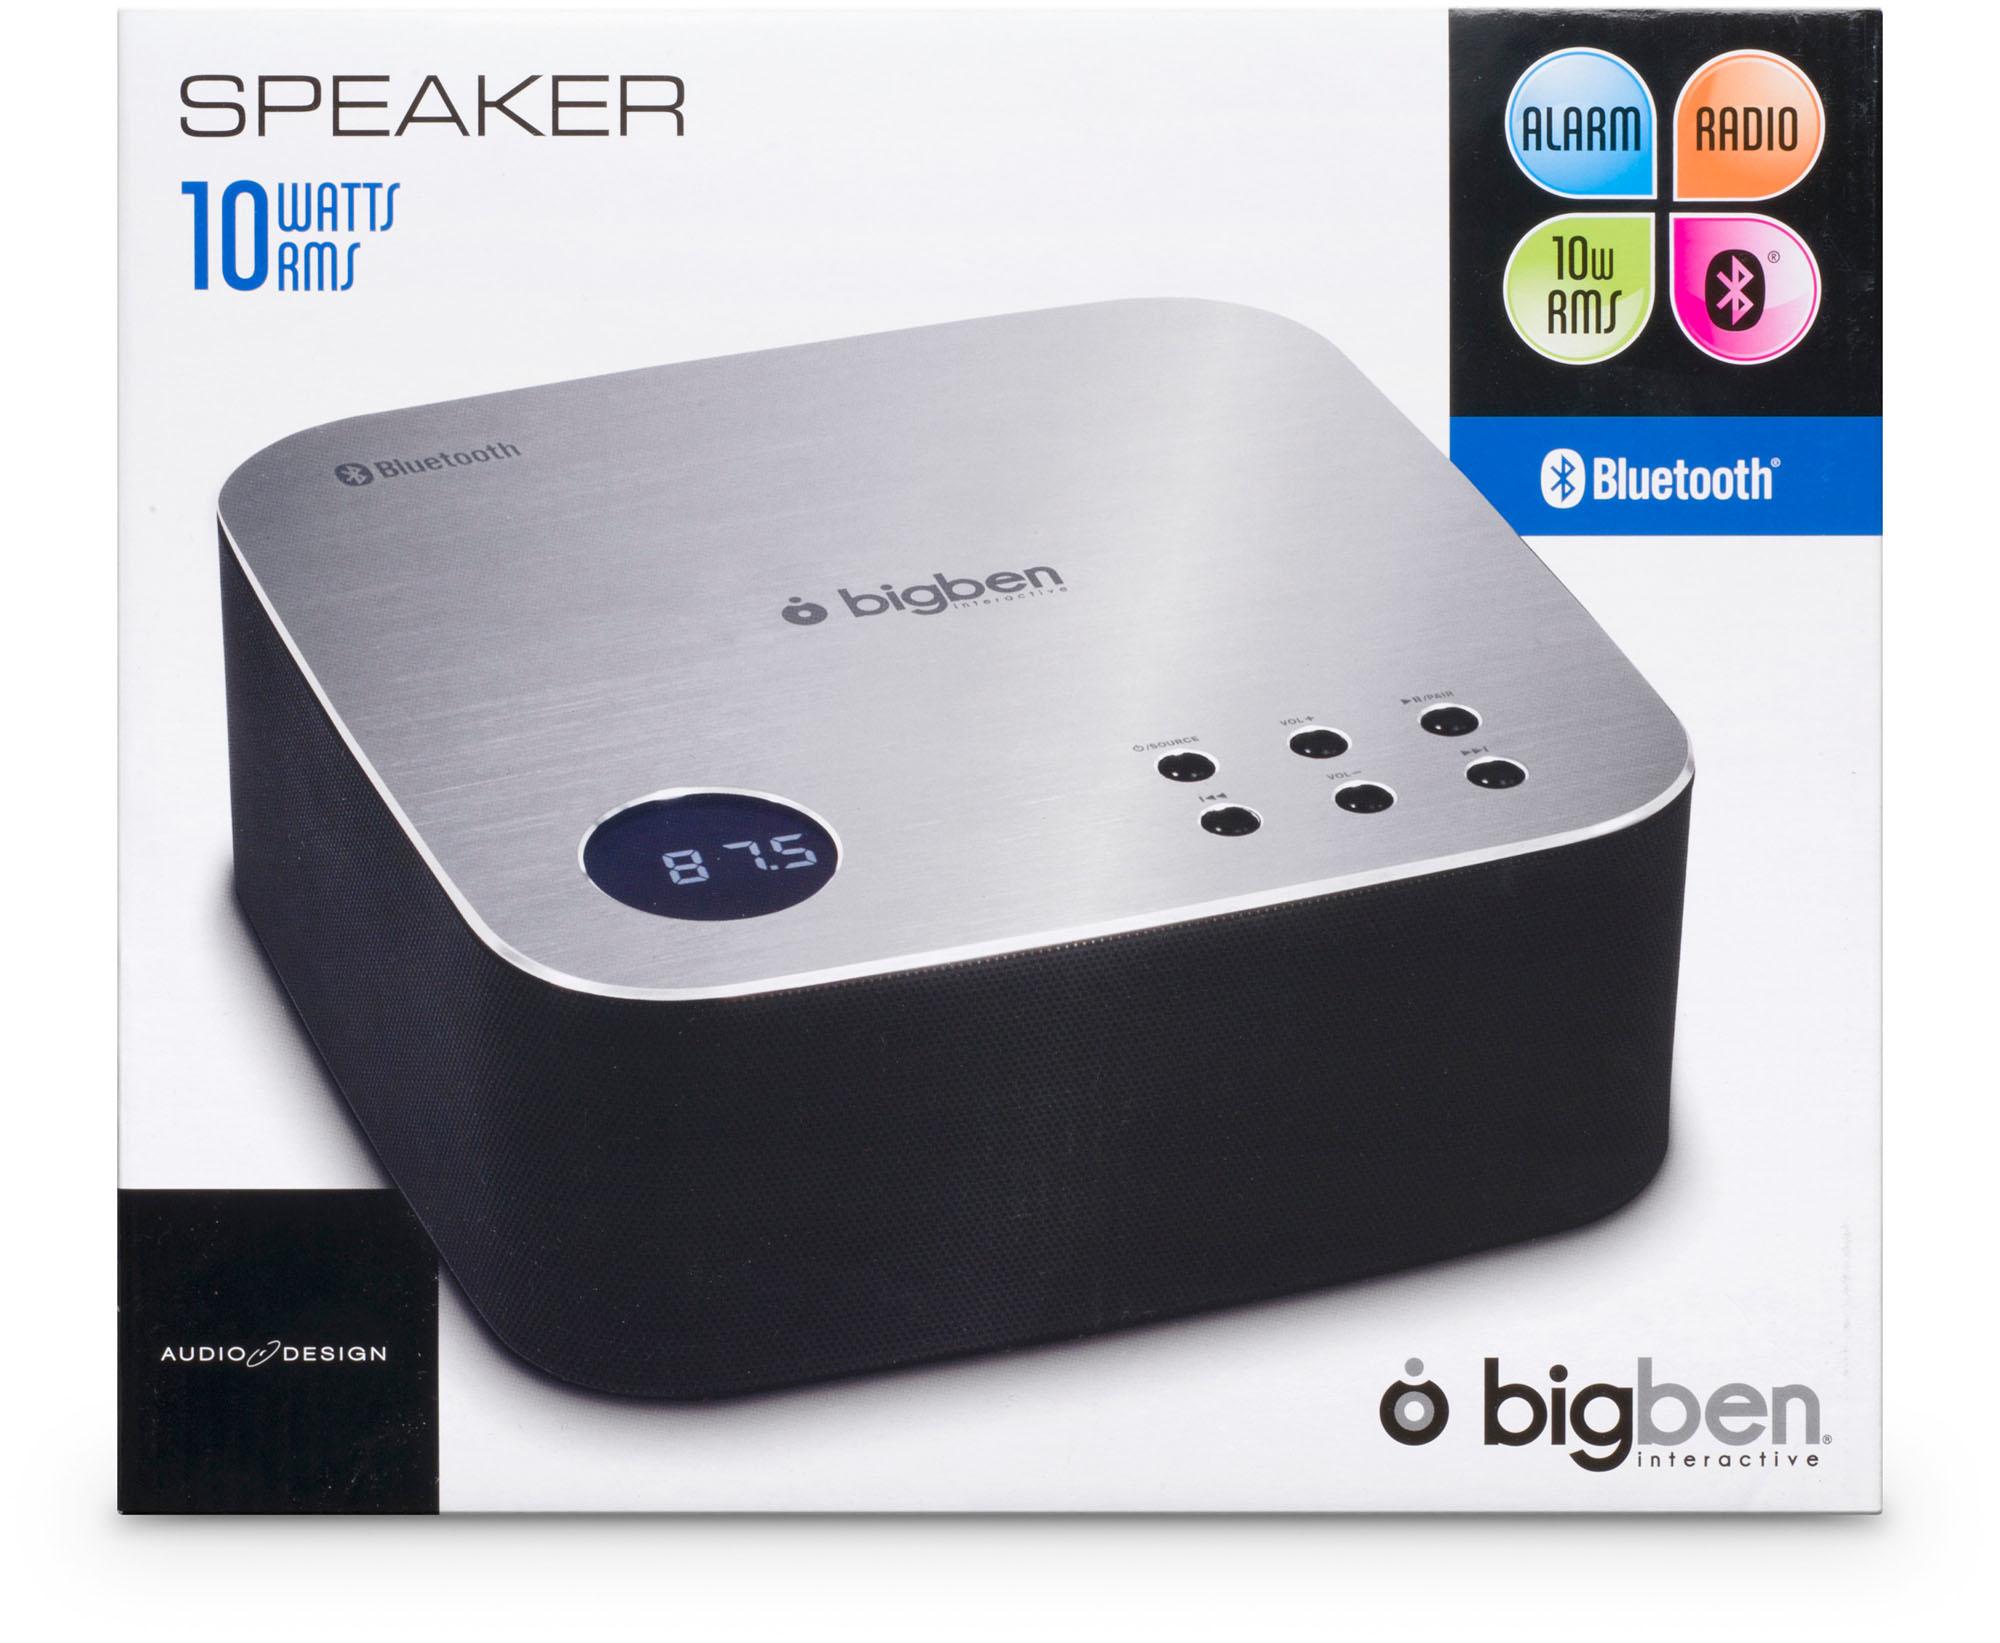 Bigben Interactive BT04SN Portatile Nero, Argento radio